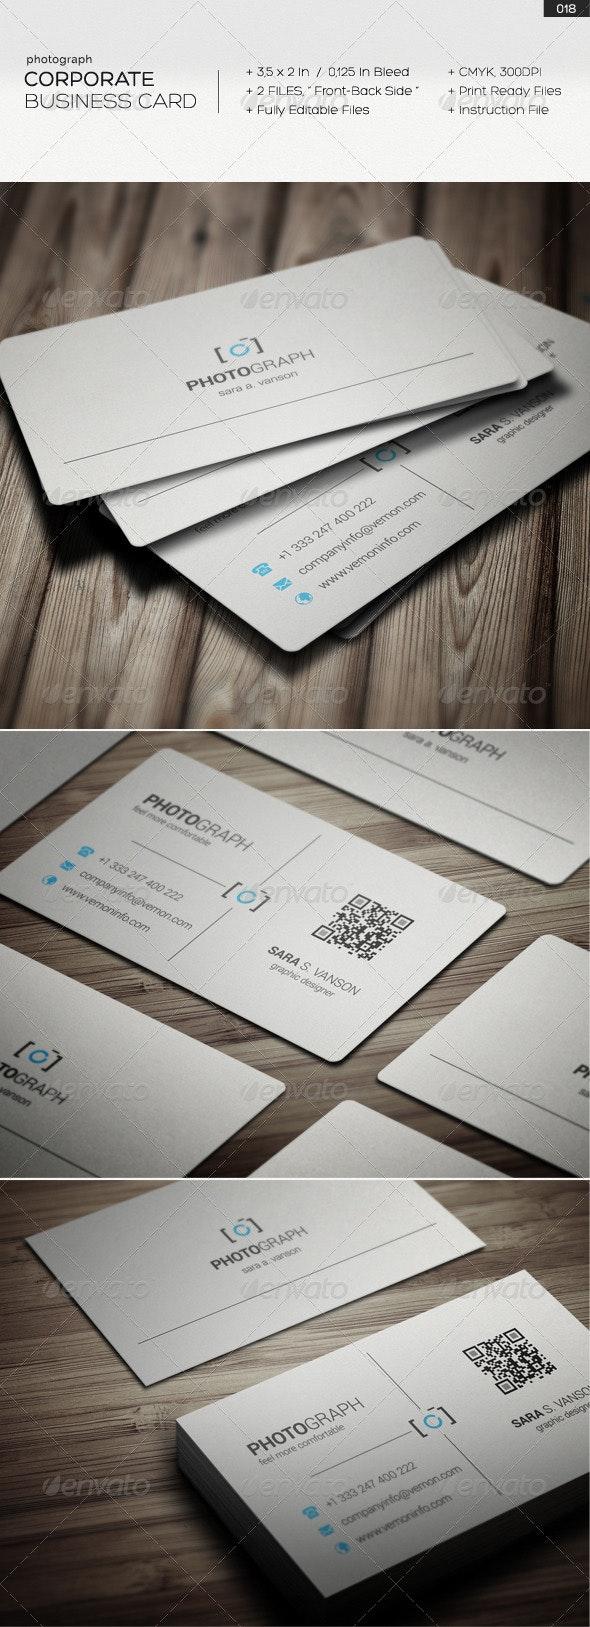 Corporate Business Card 018 - Corporate Business Cards